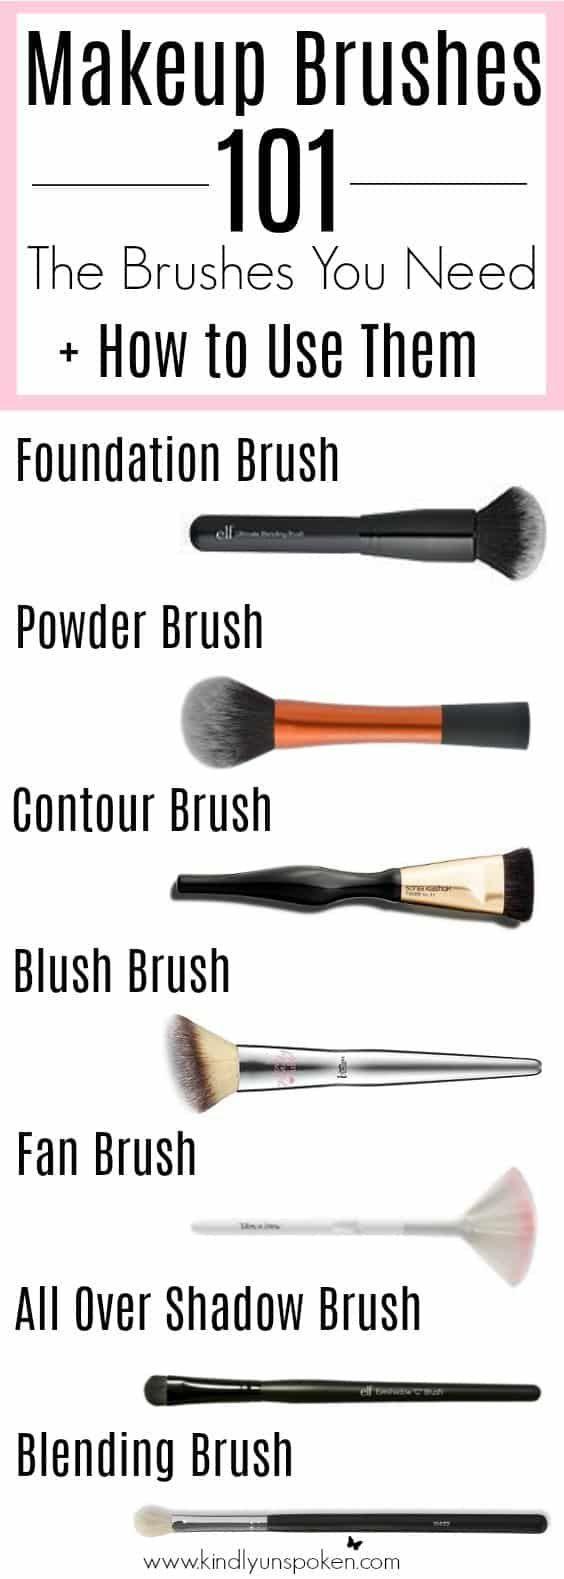 Ultimate Makeup Brush Guide Kindly Unspoken In 2020 Makeup Brushes Guide Makeup Brushes 101 Eye Makeup Brushes